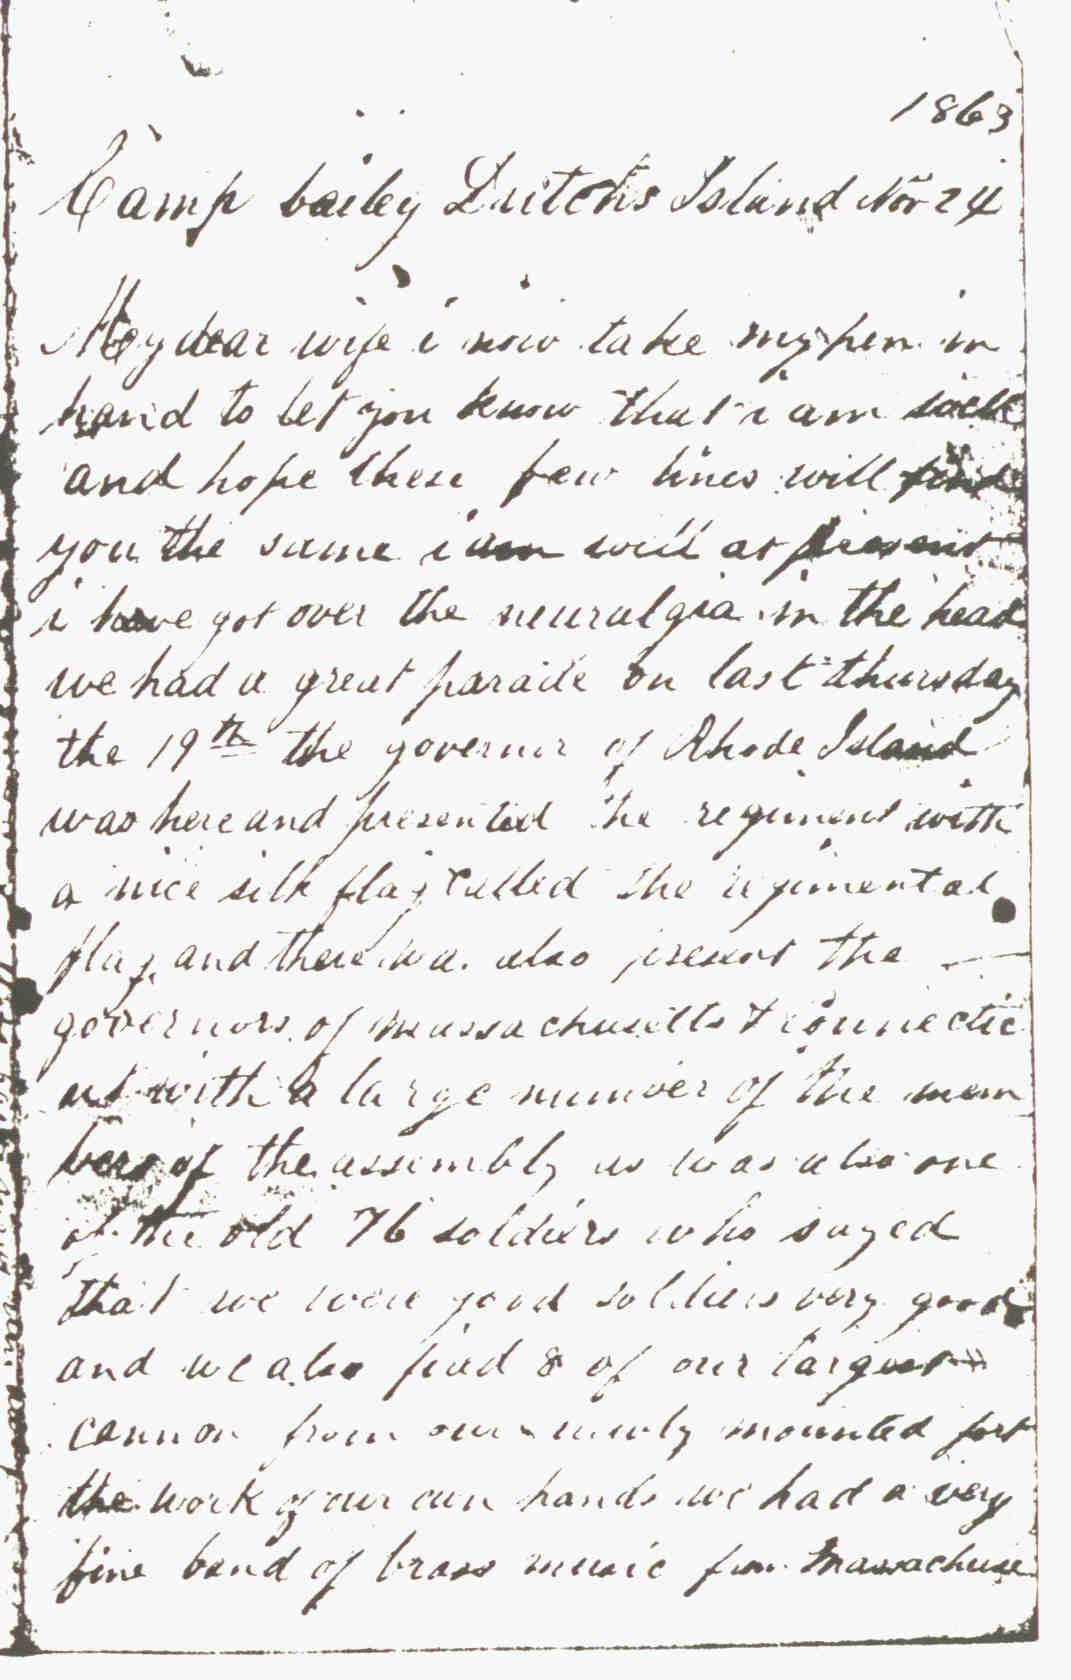 simeon tierce letters 1863 p01jpg